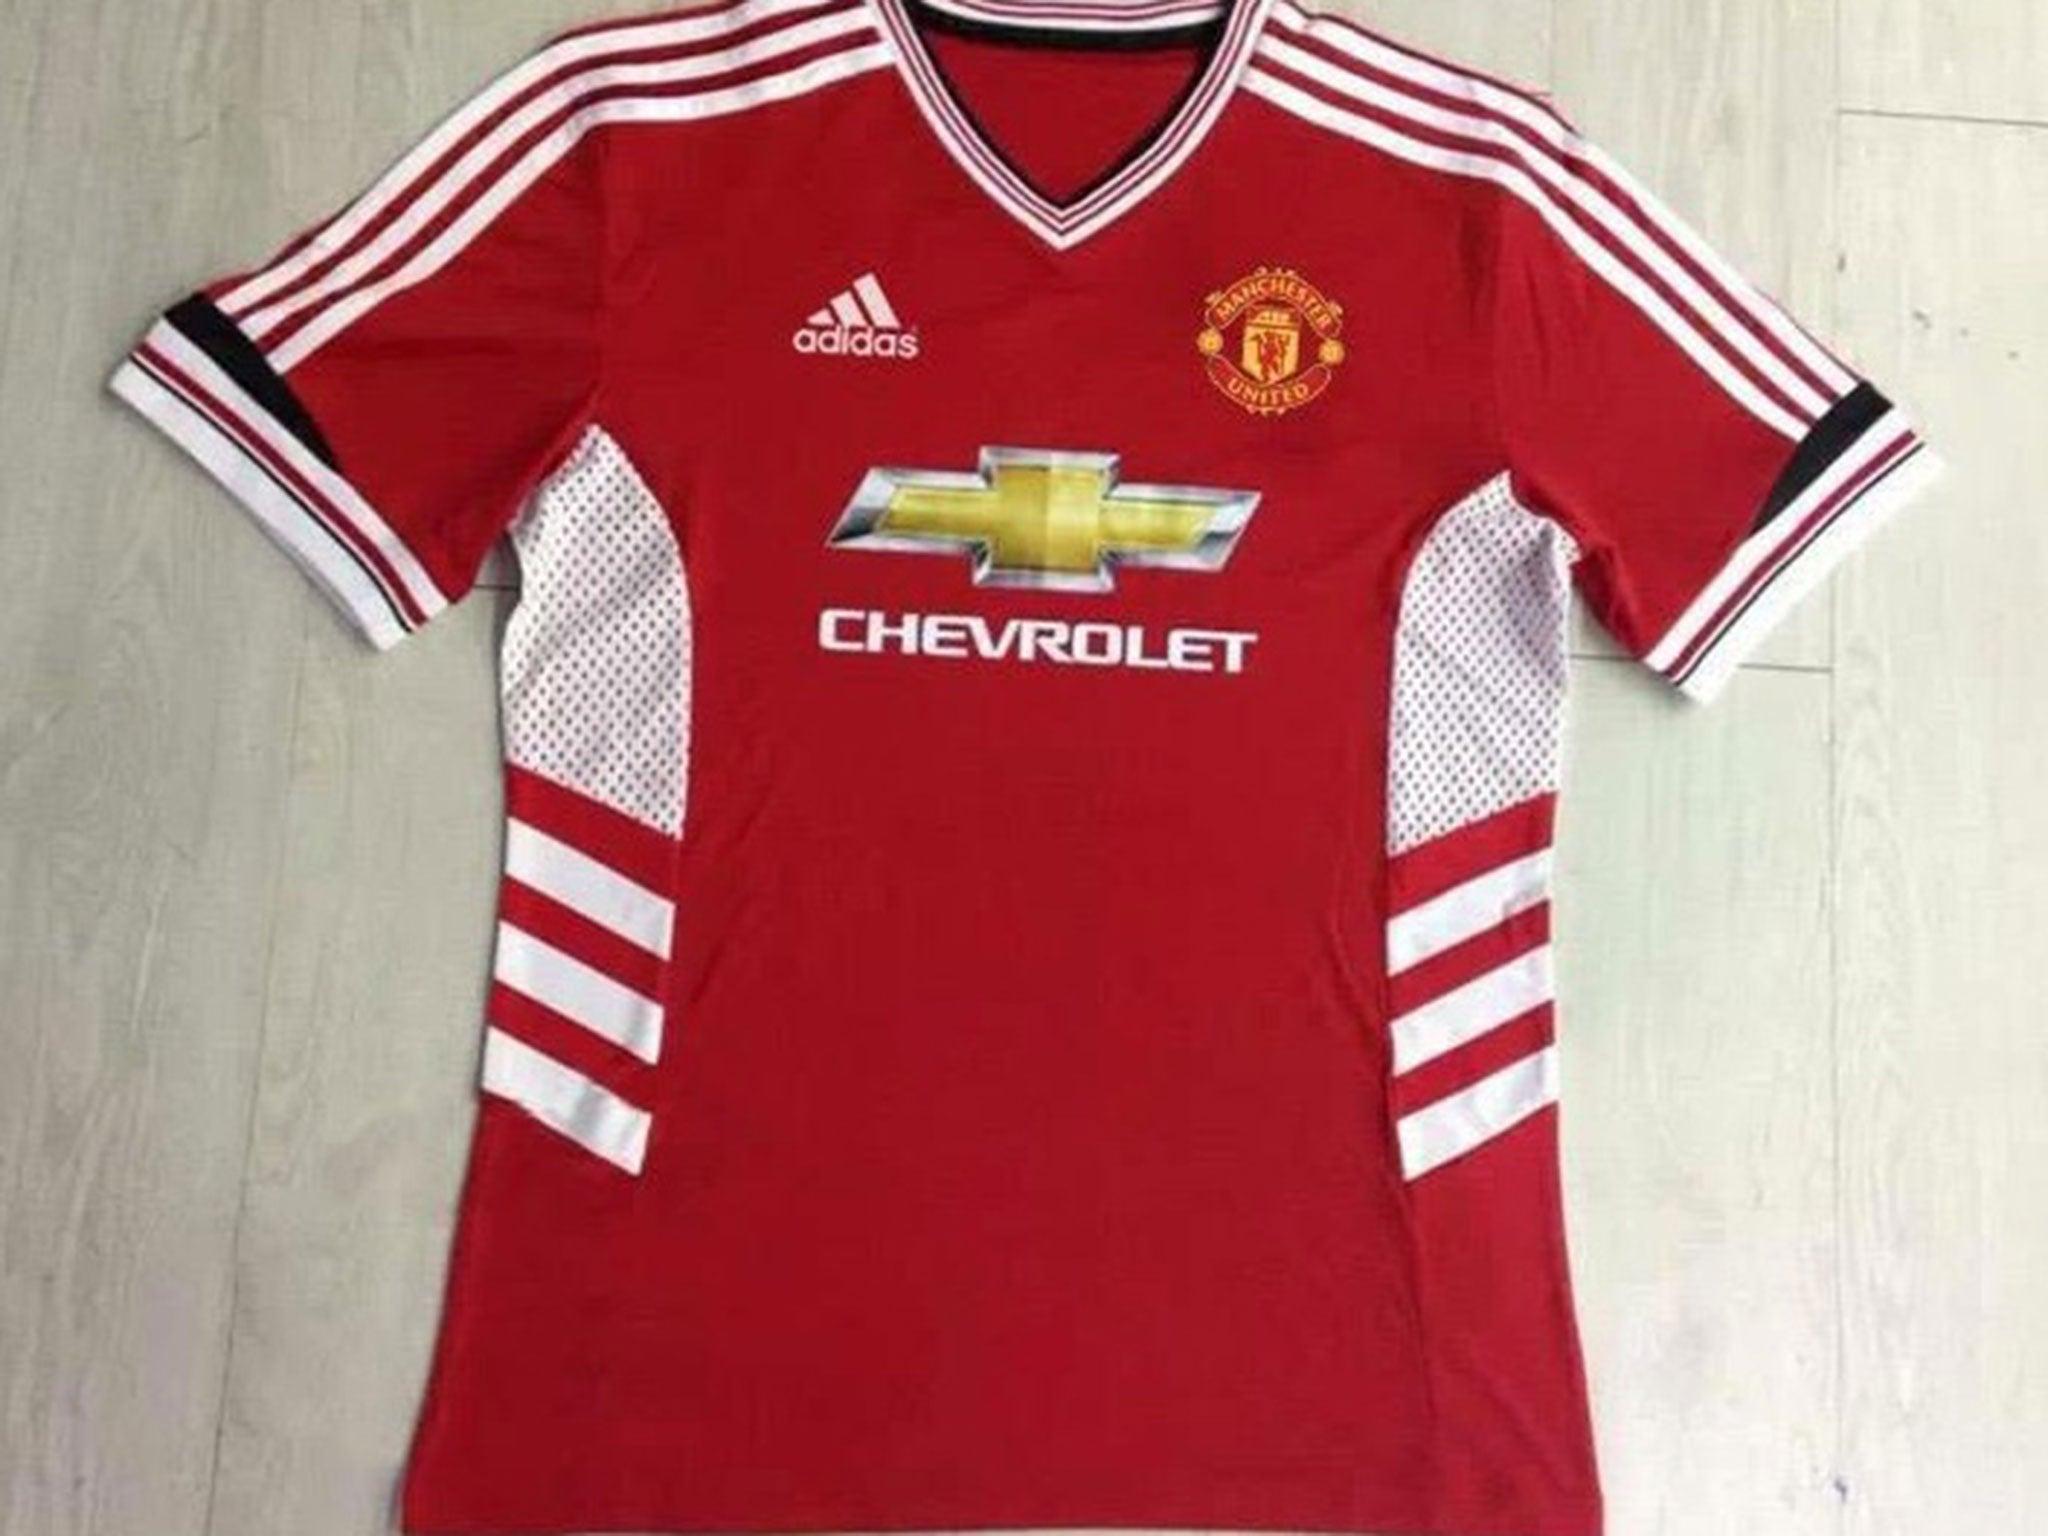 brand new 26460 bc9ca Manchester United 2015/16 shirt: United fans slam 'hideous ...